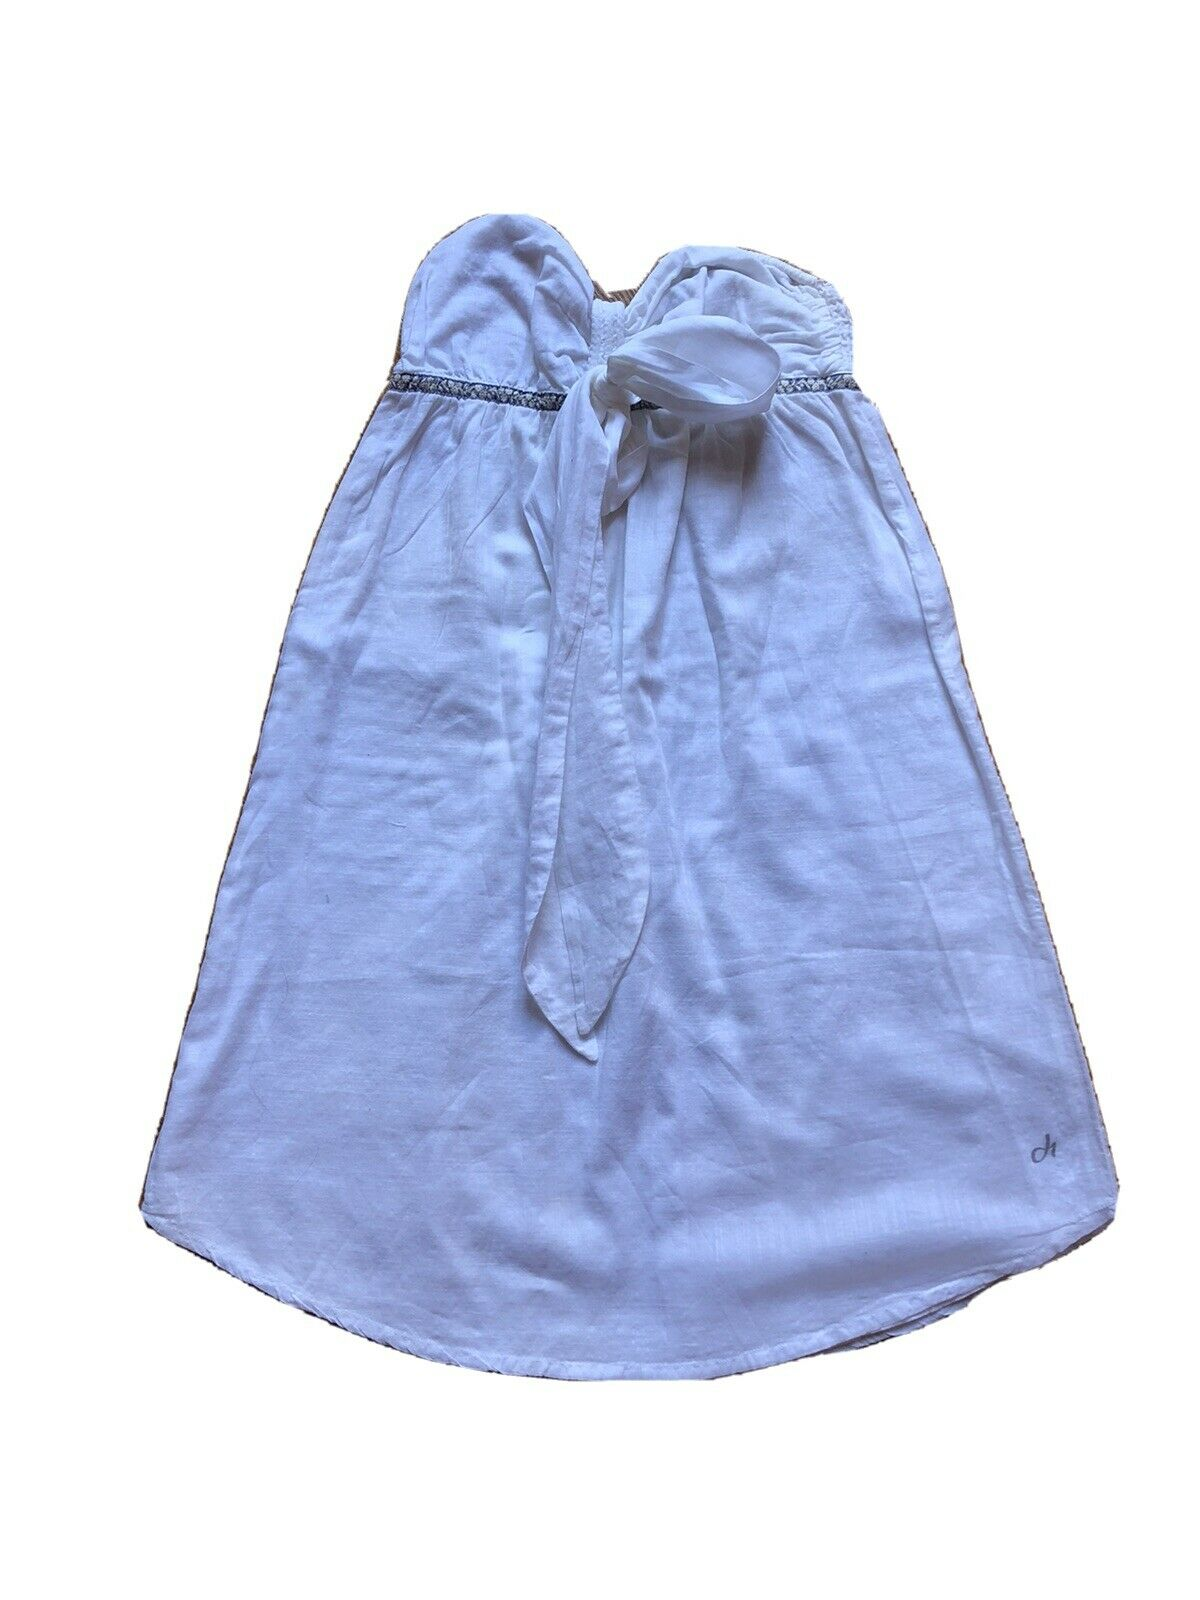 Deha Kleid 36 Schneeweiss Strandkleid 100 % Baumwolle